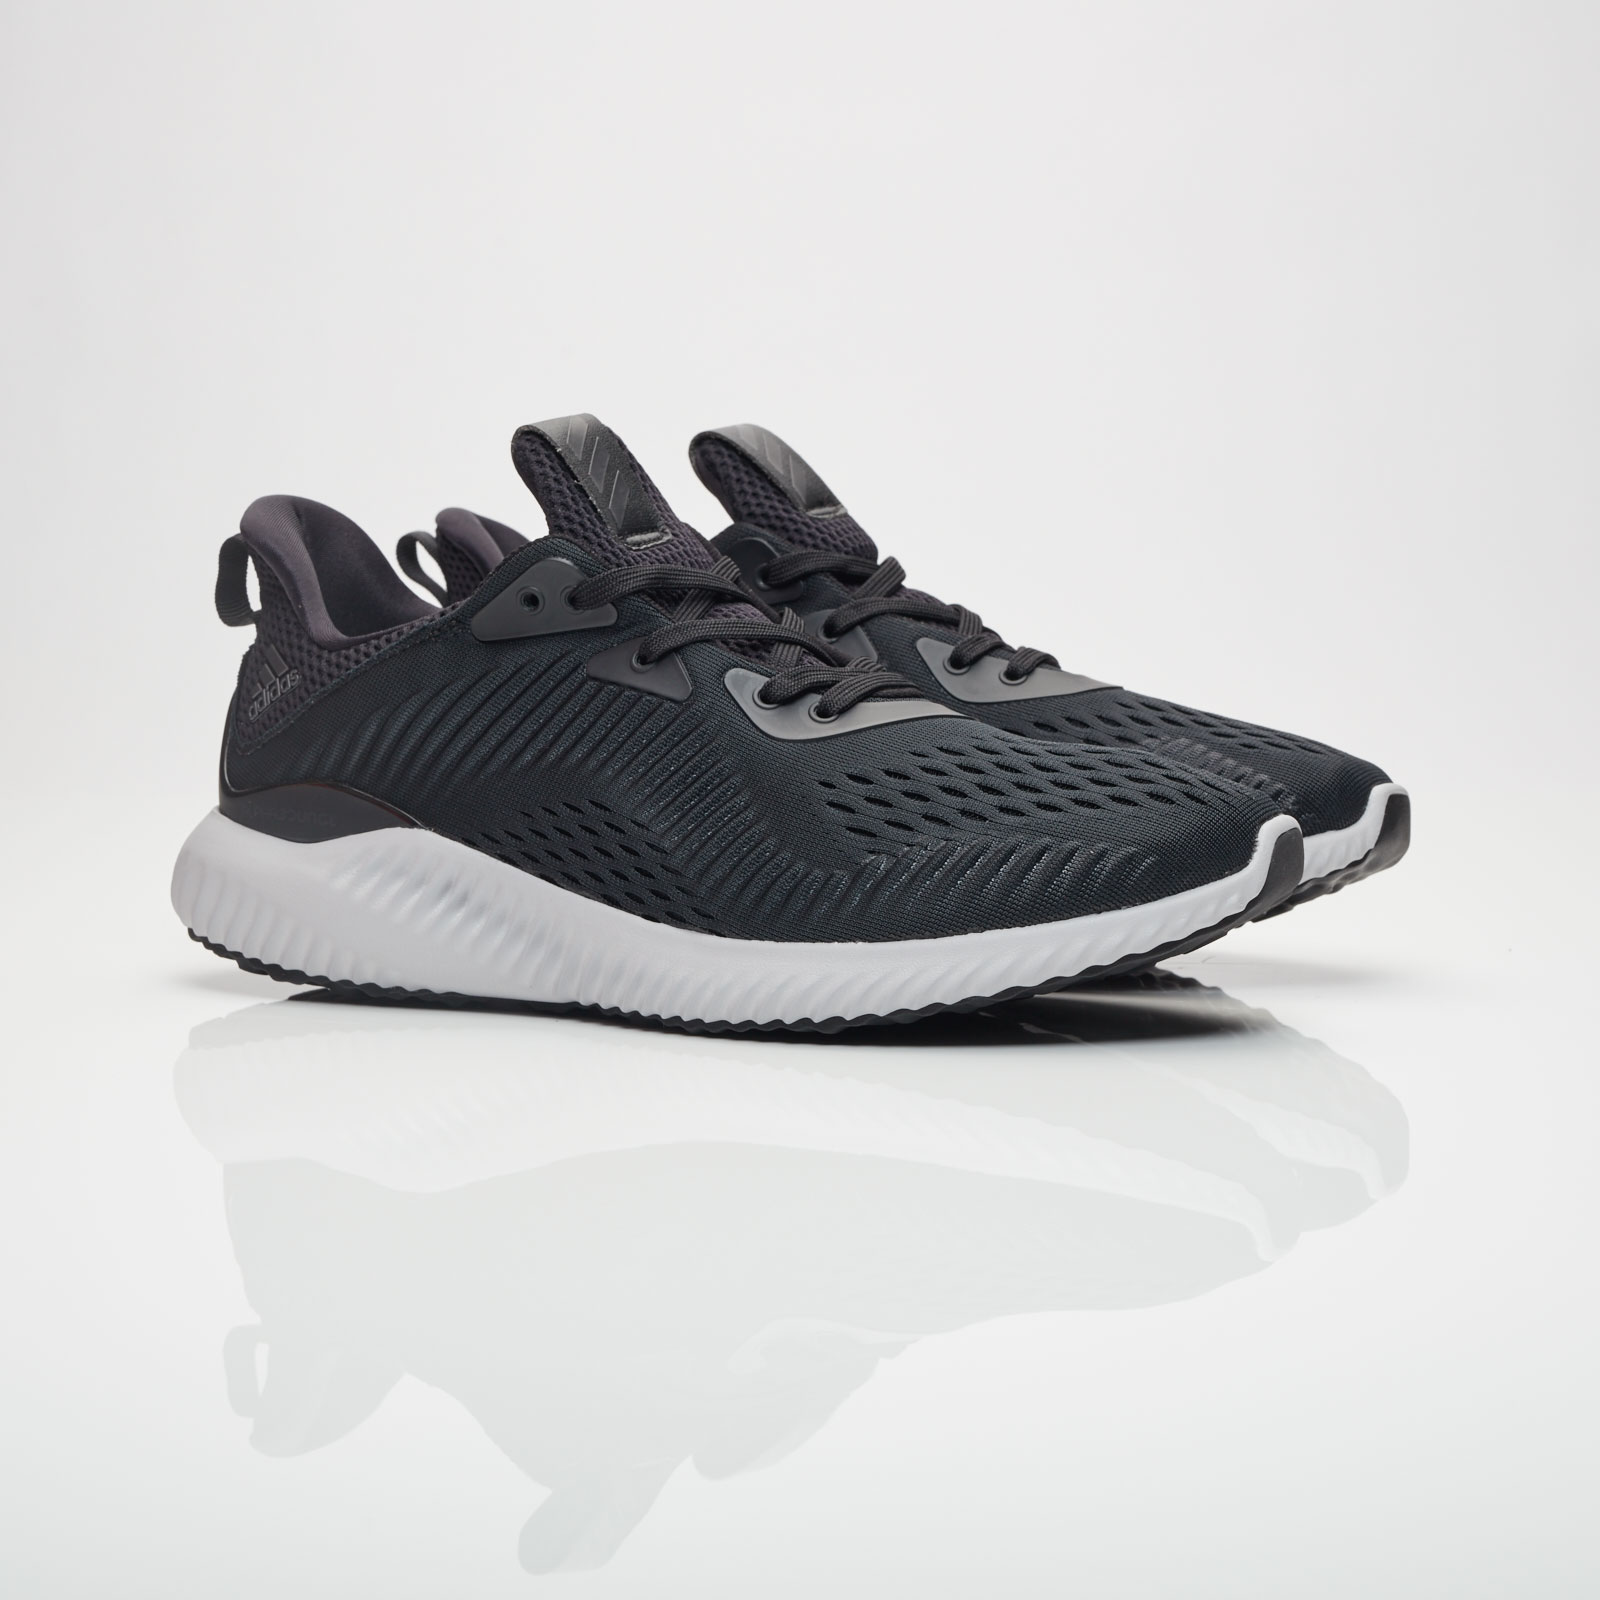 adidas Alphabounce Em M - By4264 - Sneakersnstuff  21c099e1d